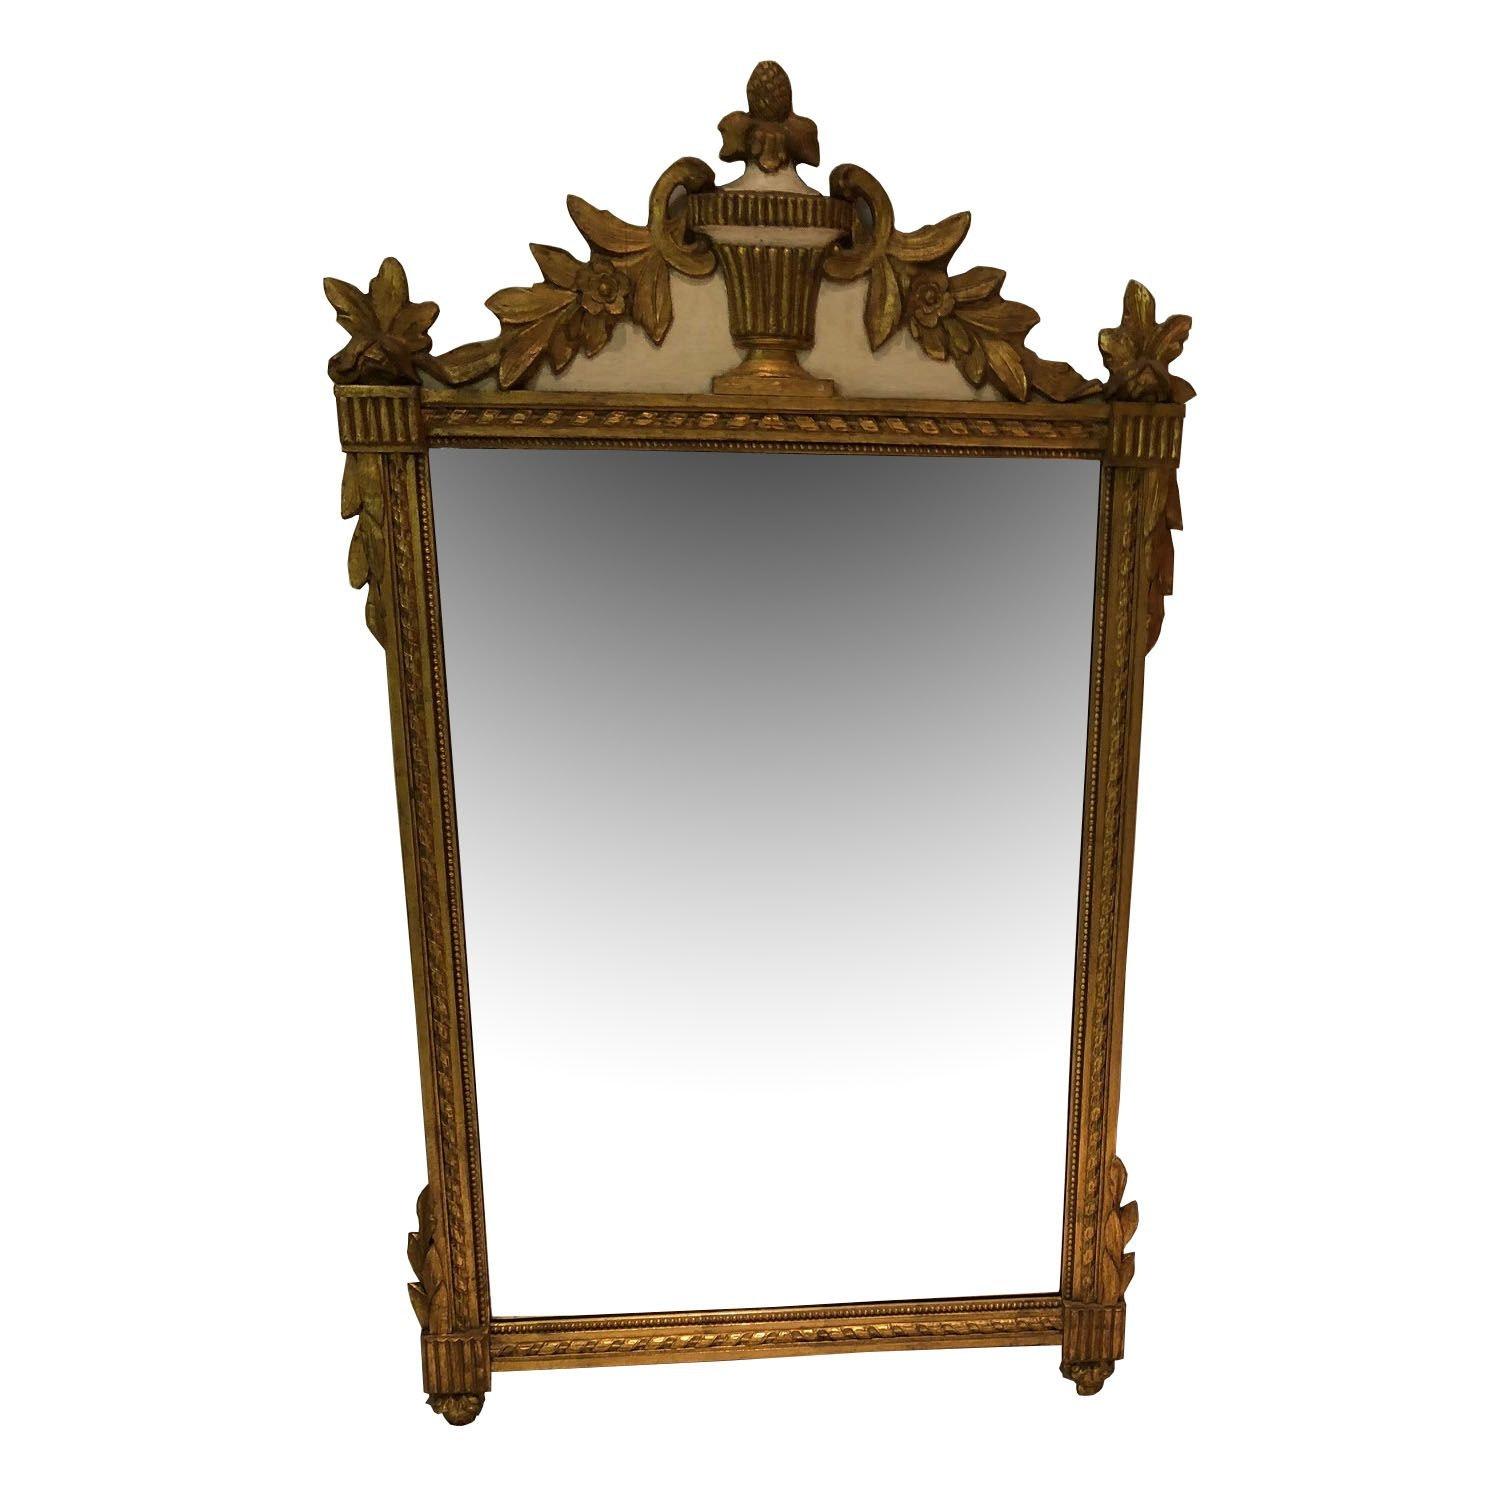 Giltwood Greek Revival Style Wall Mirror